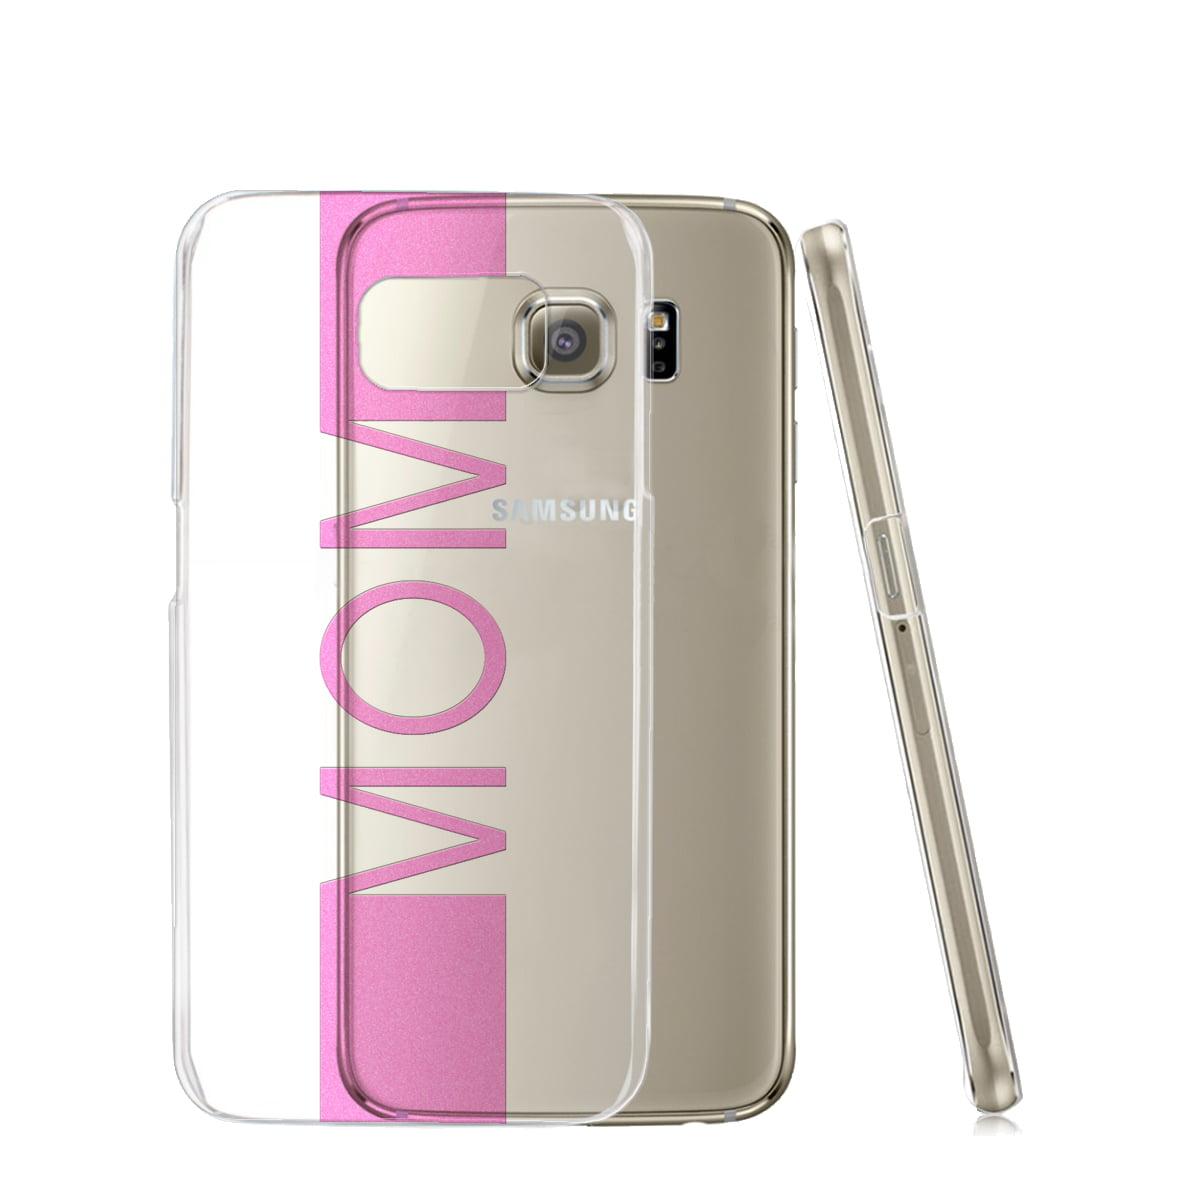 KuzmarK™ Samsung Galaxy S6 Clear Cover Case - Mom